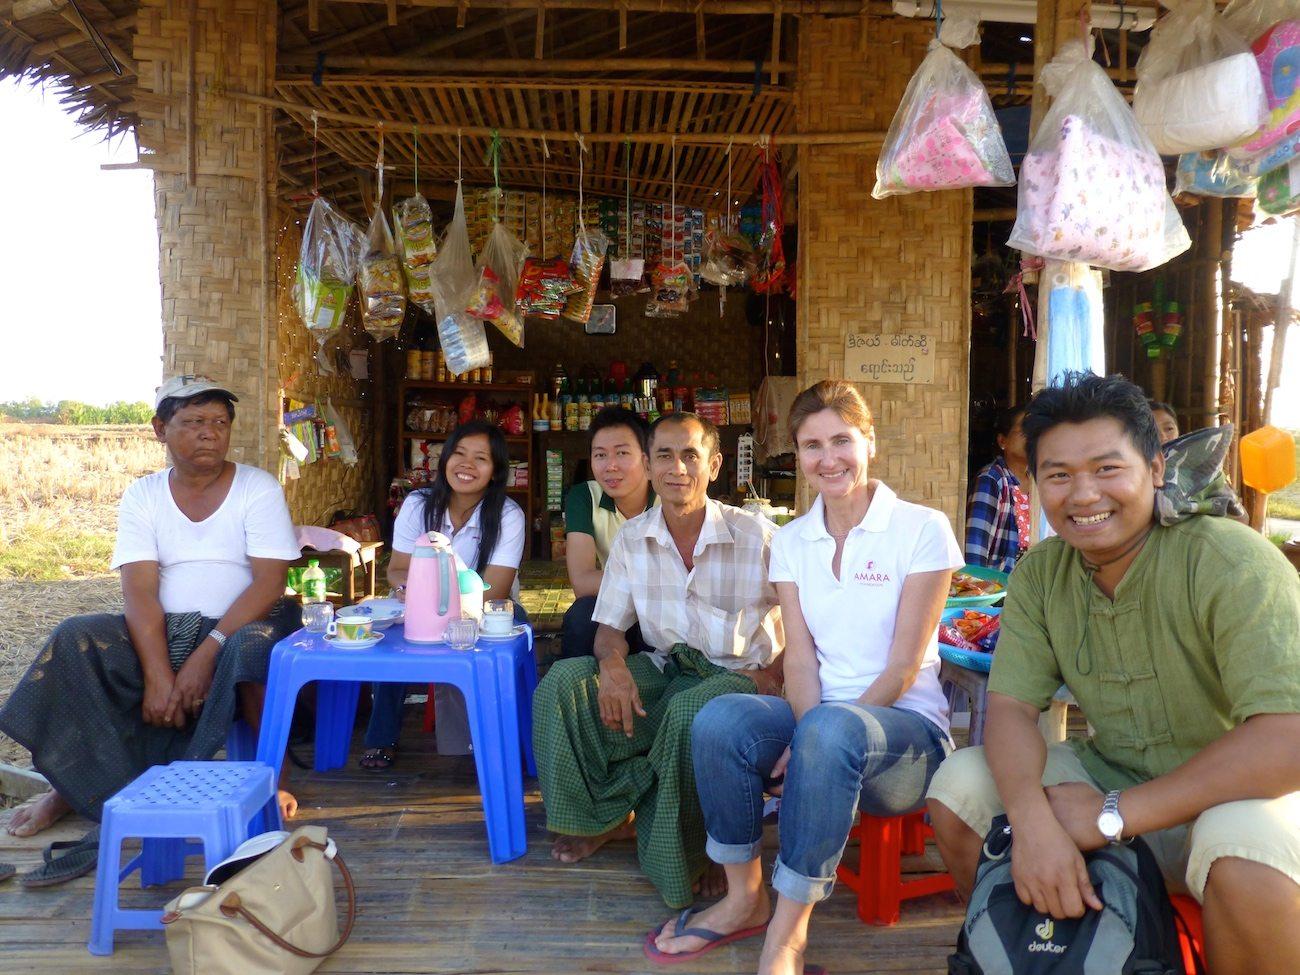 Amara Foundation visit